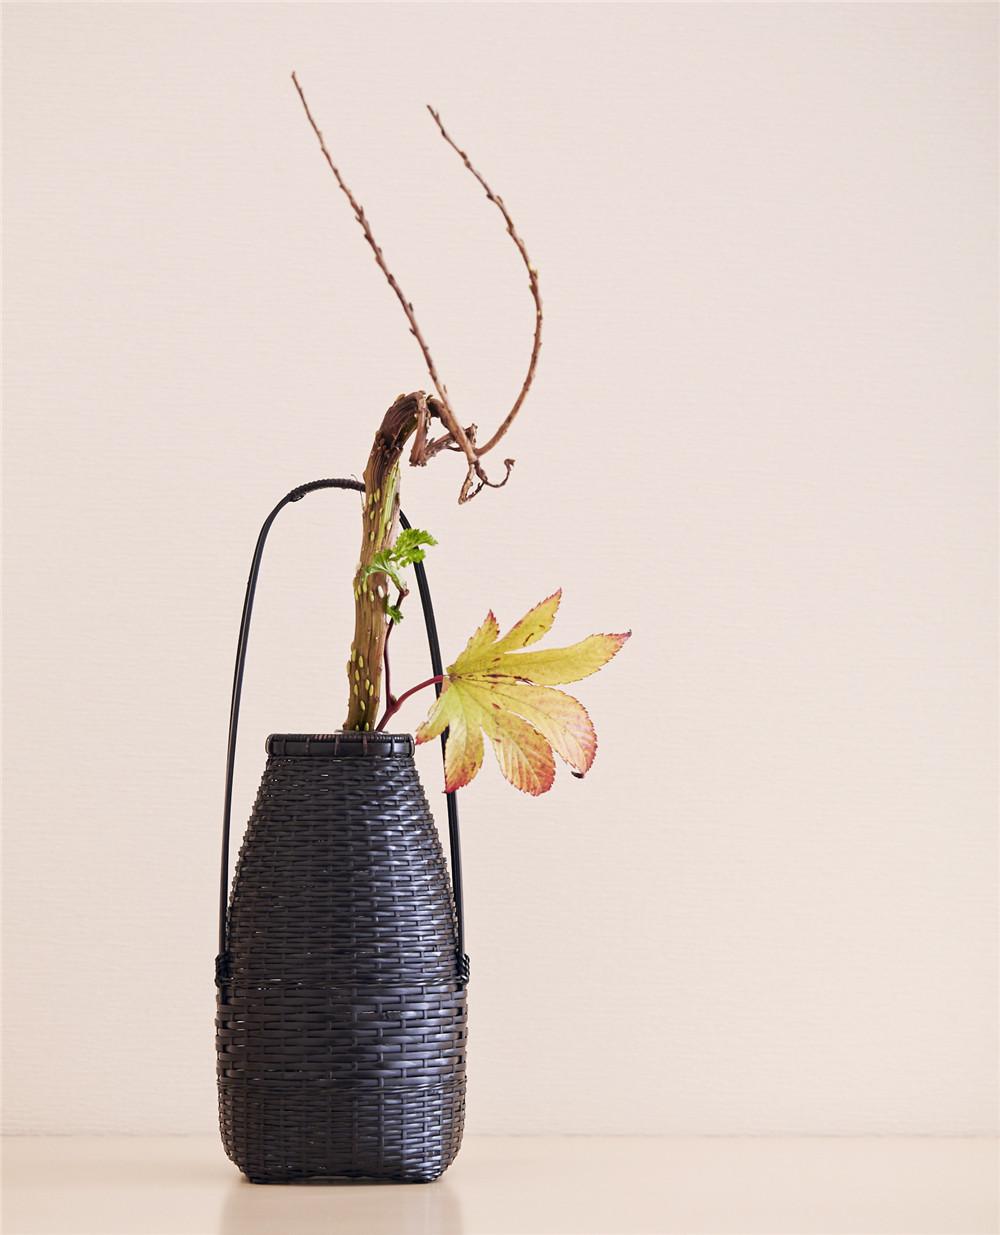 bamboo-crafts-hisheji (6)